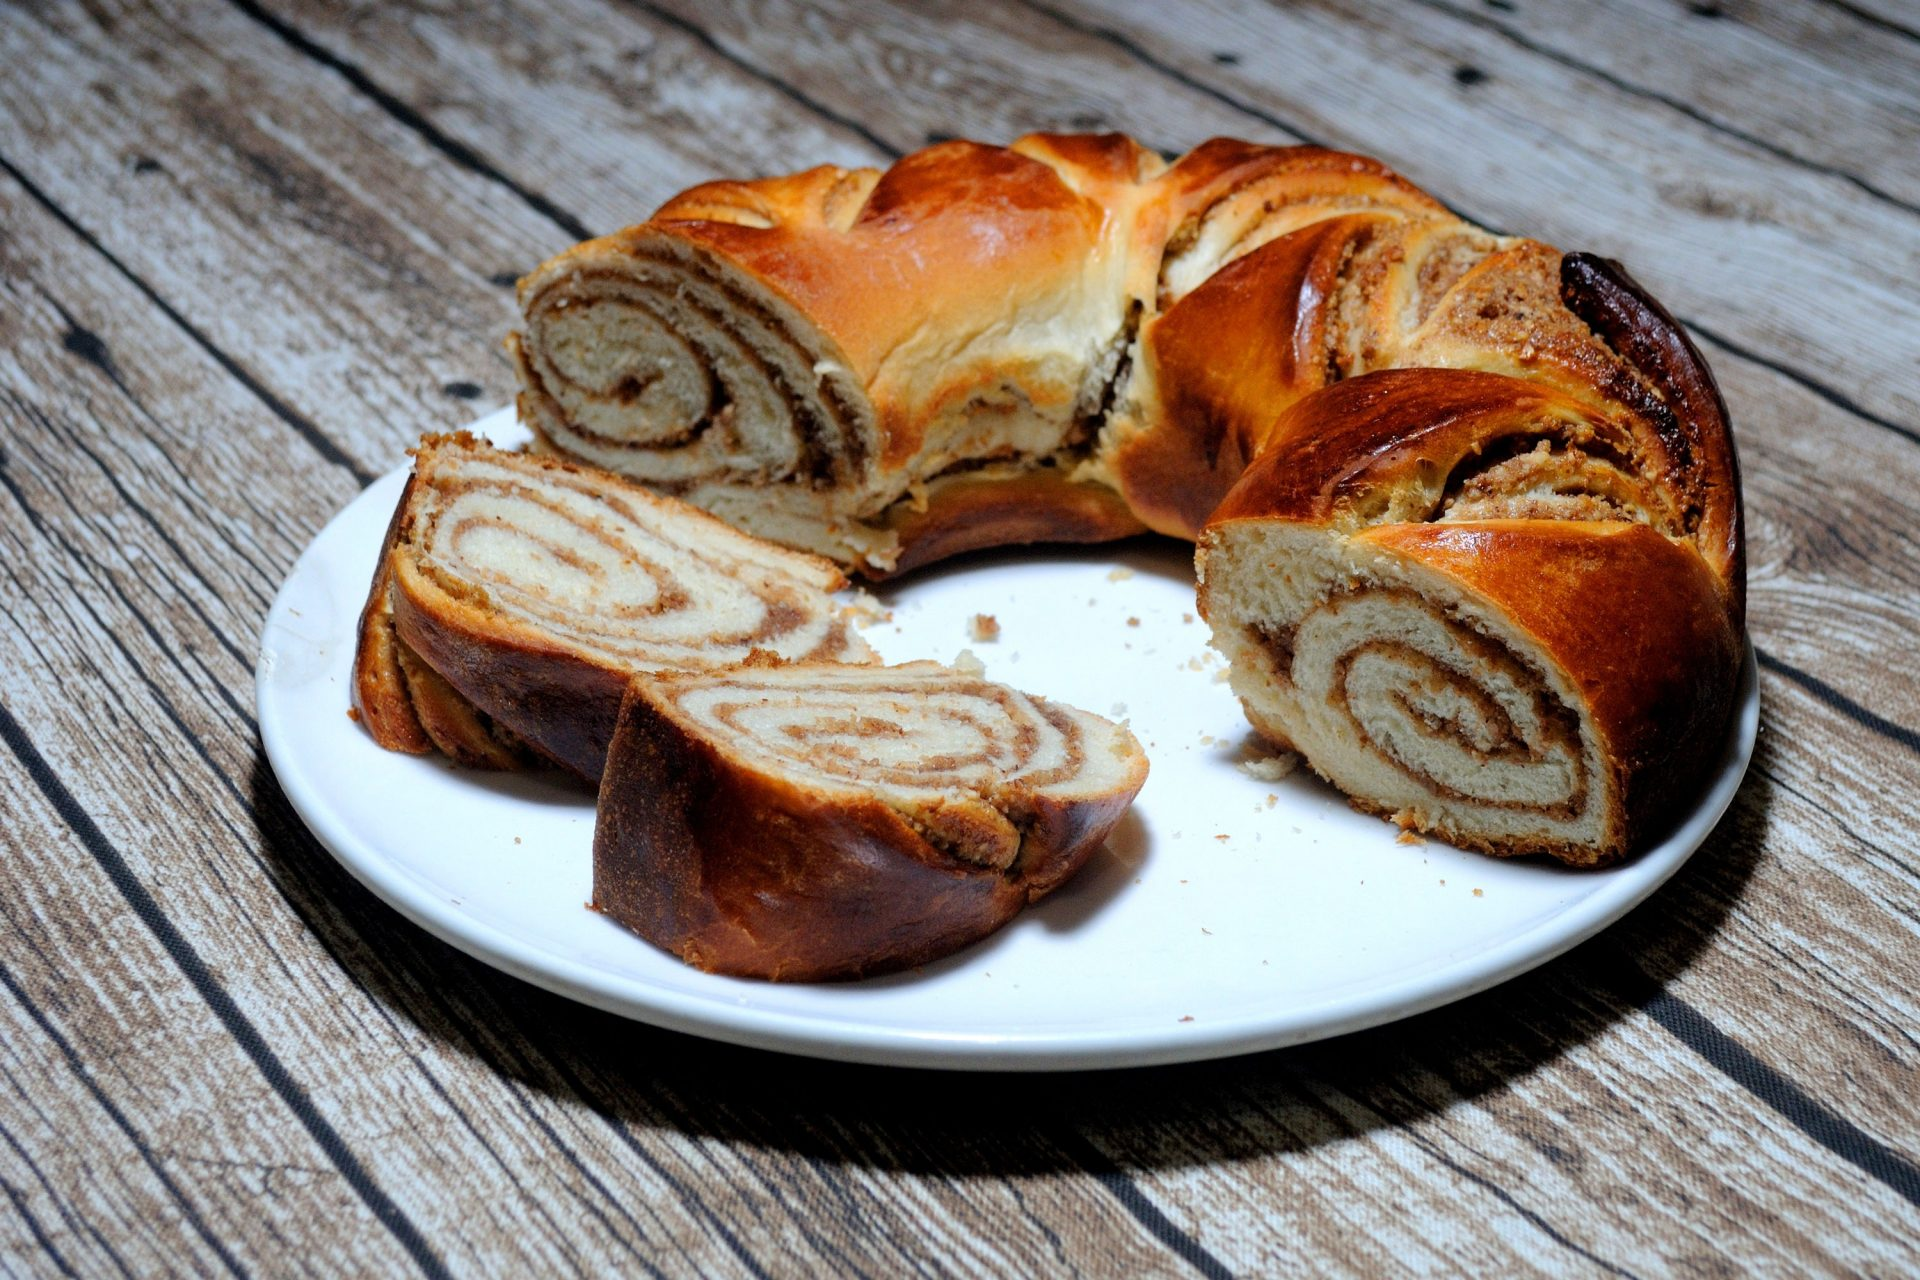 bake-bakery-baking-221150